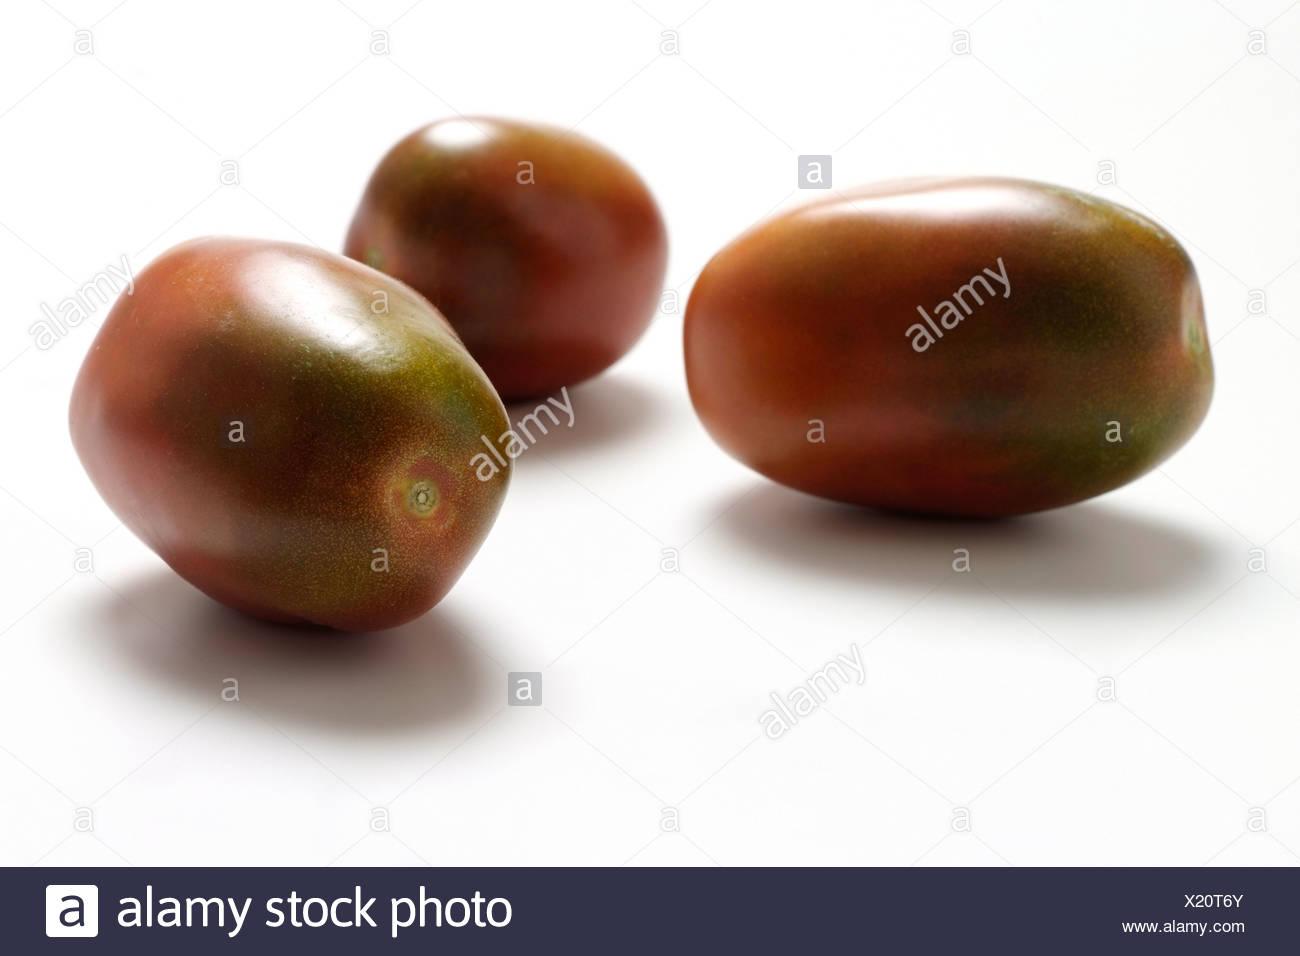 Tomato varieties: Black Plumtomato - Stock Image